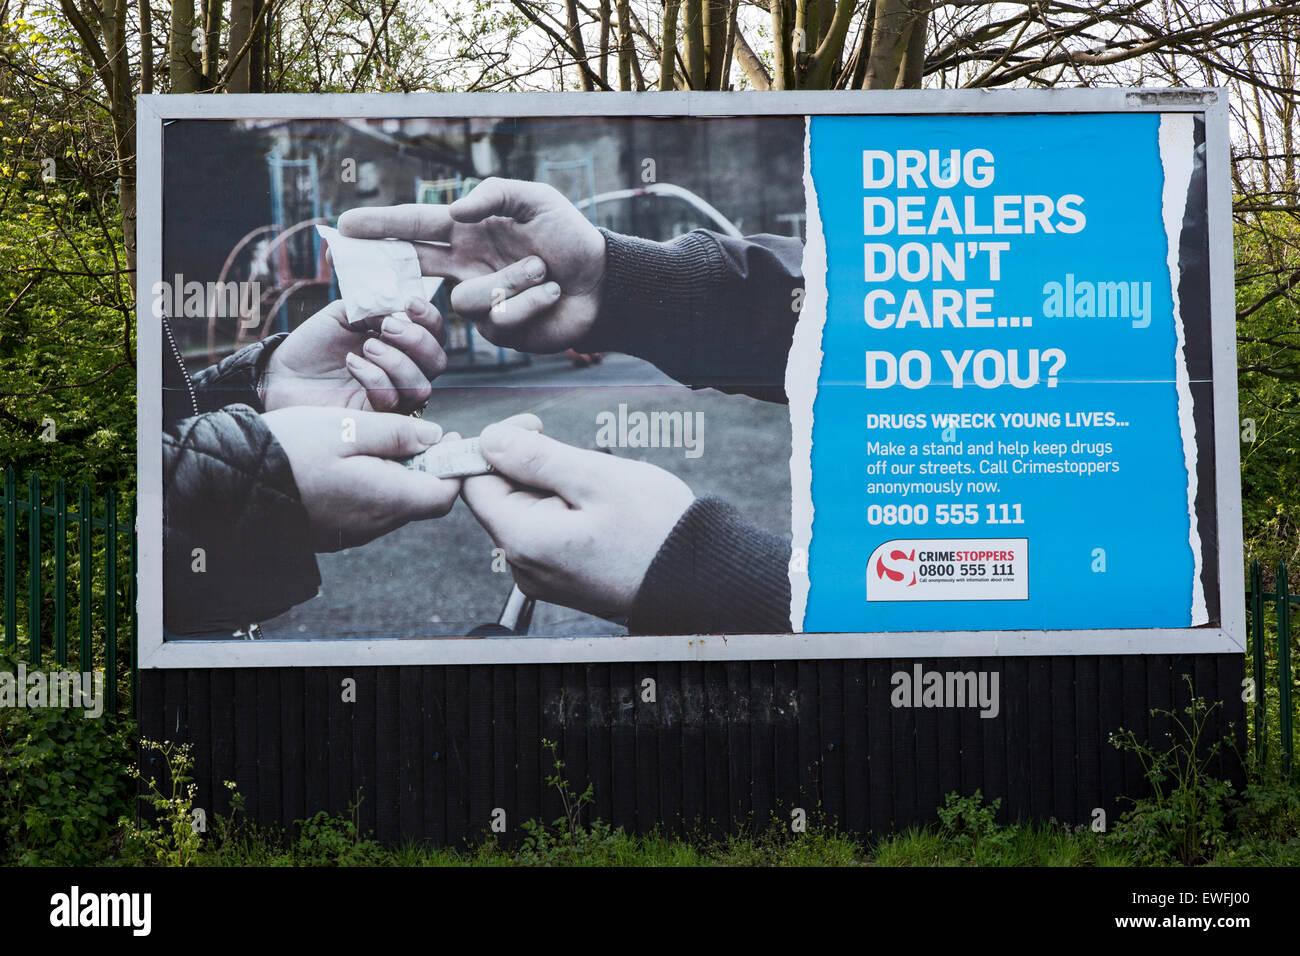 Póster anti drogas Ipswich, Suffolk, Inglaterra, Reino Unido. Foto de stock